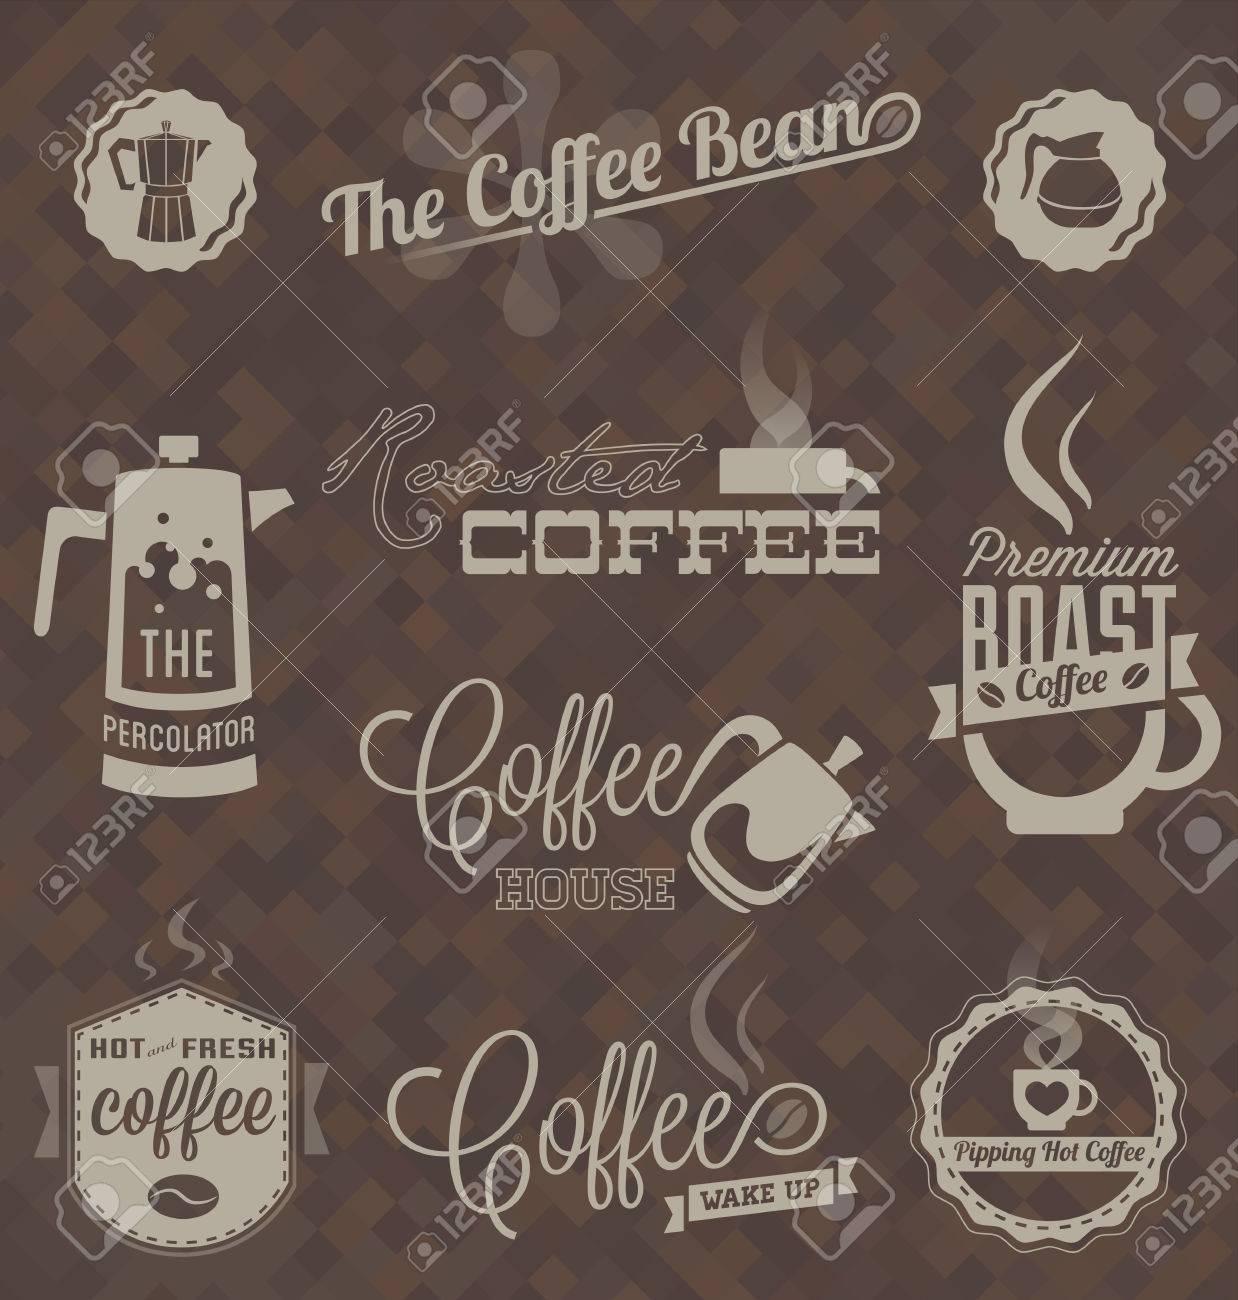 Vector Set  Retro Coffee Shop Labels and Symbols Stock Vector - 23241712